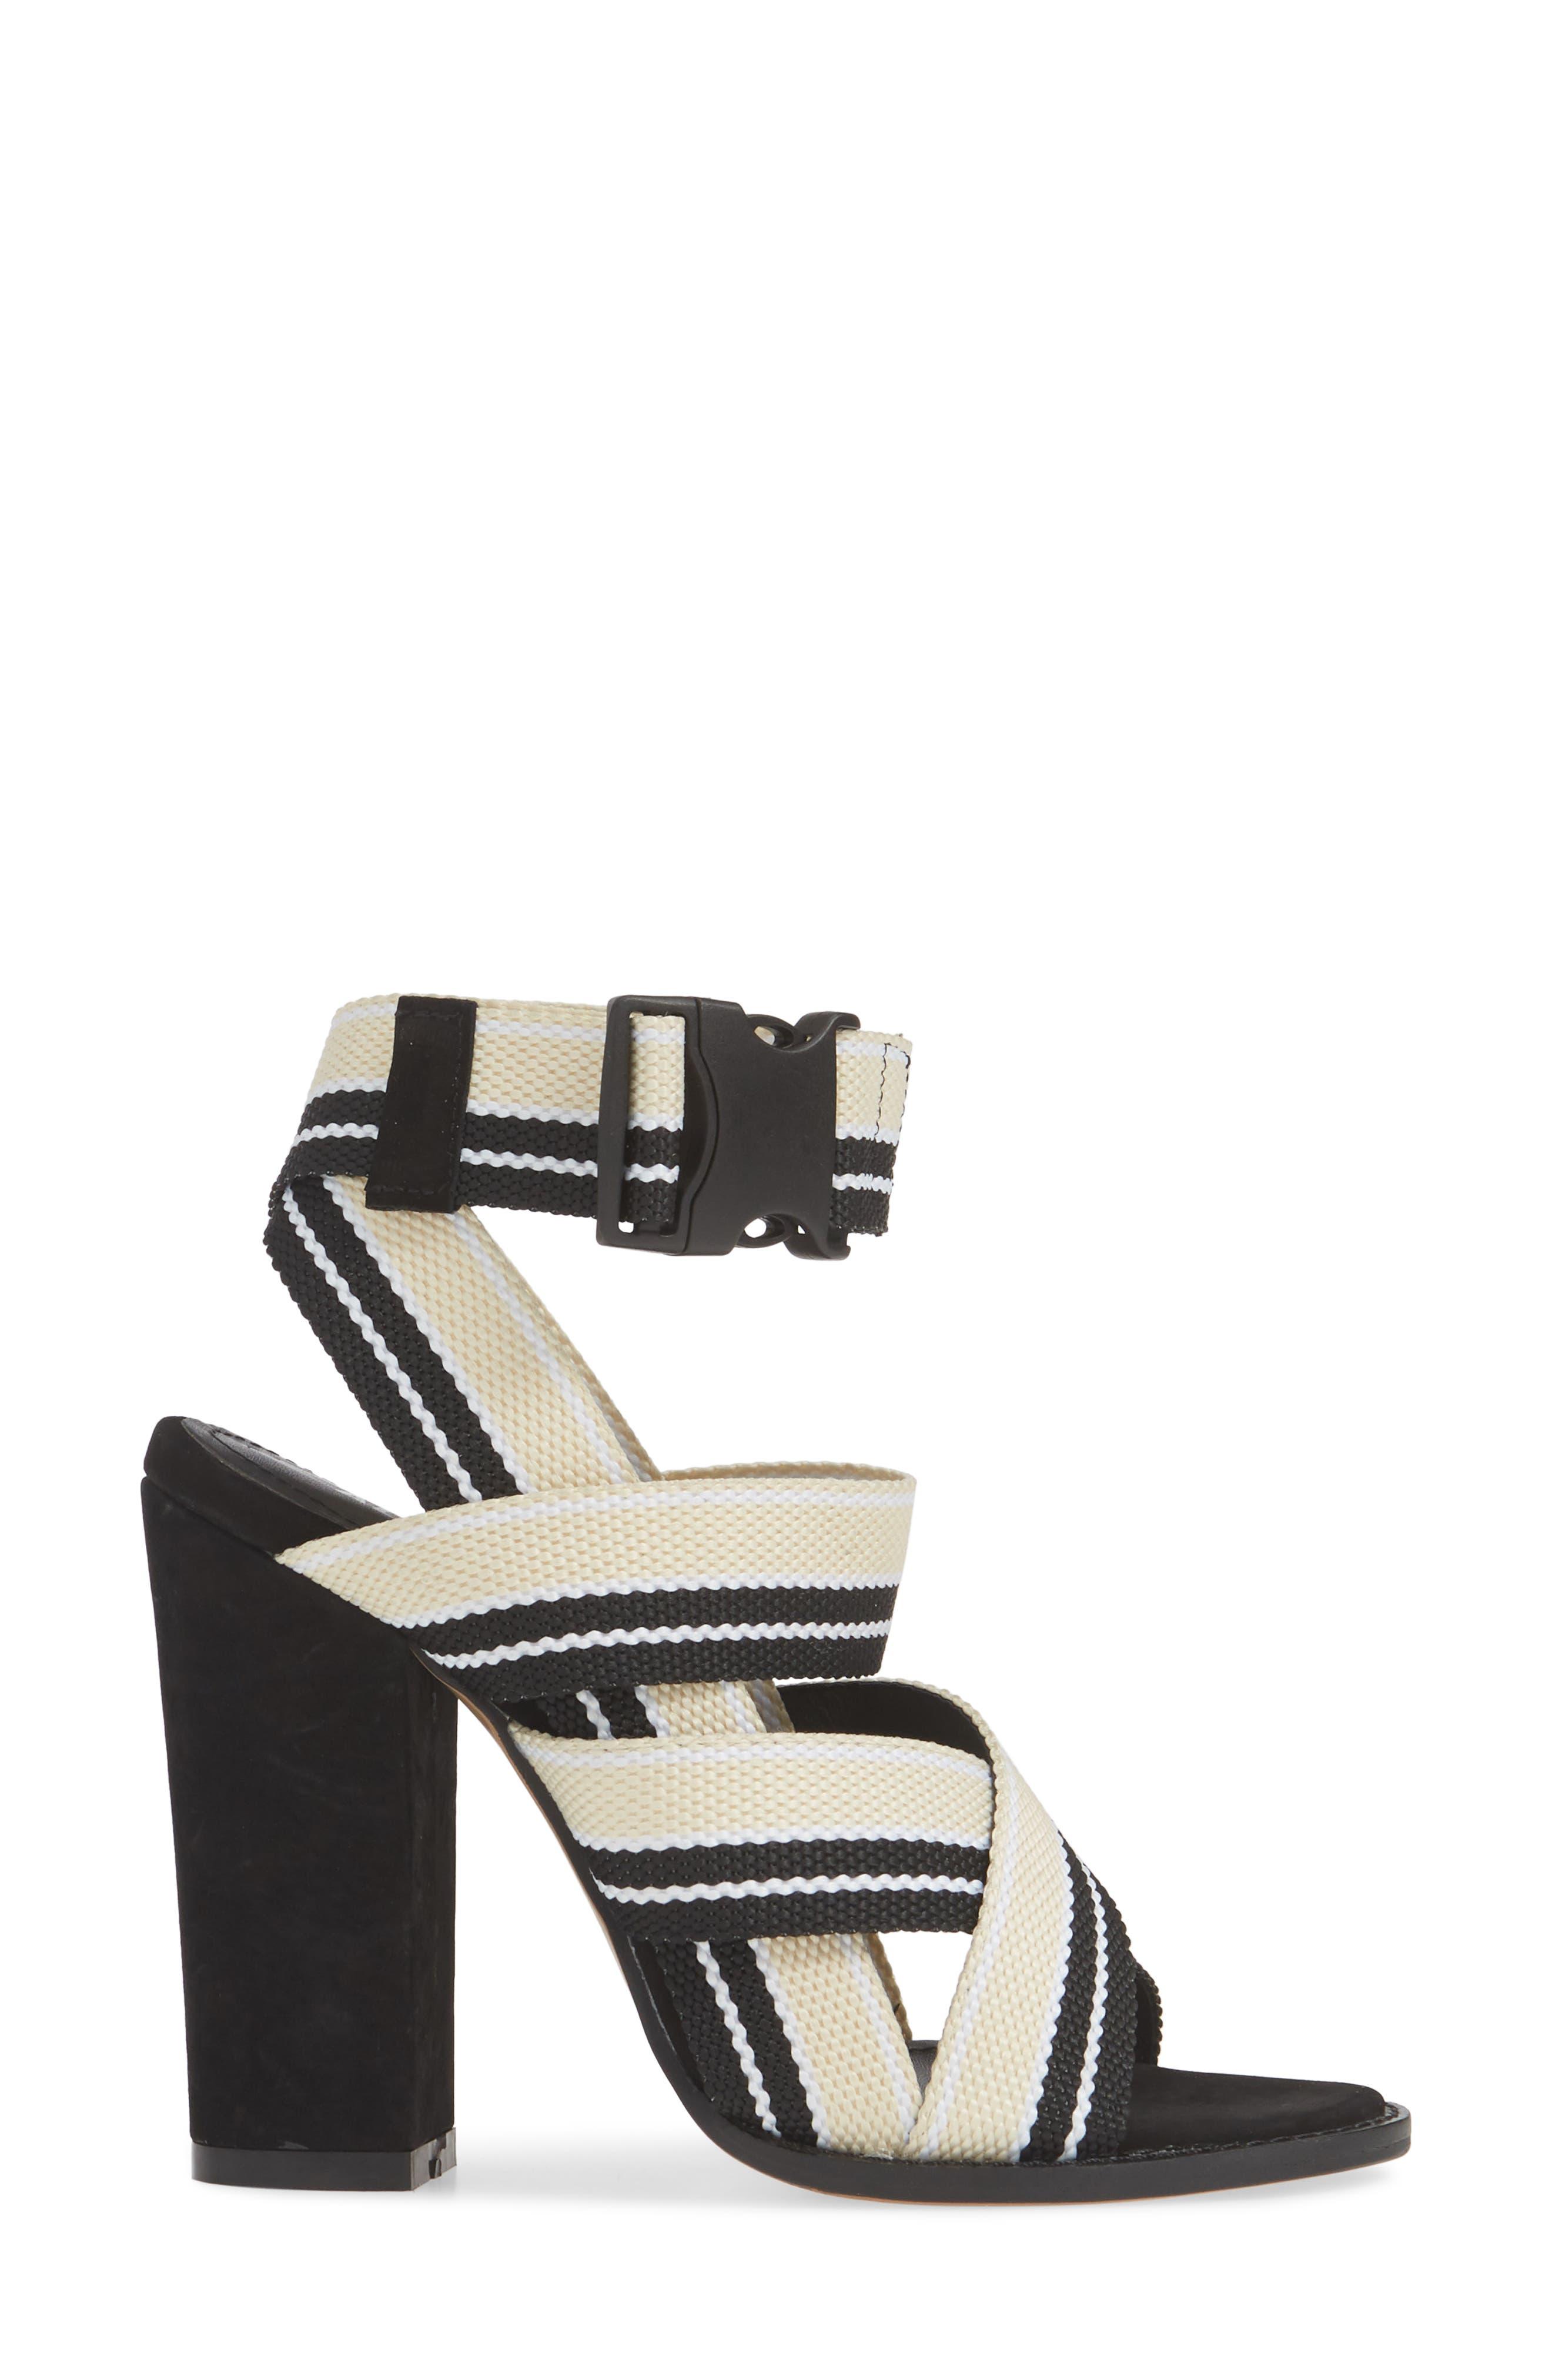 ALIAS MAE, Woven Strappy Sandal, Alternate thumbnail 3, color, NUDE/ BLACK FABRIC